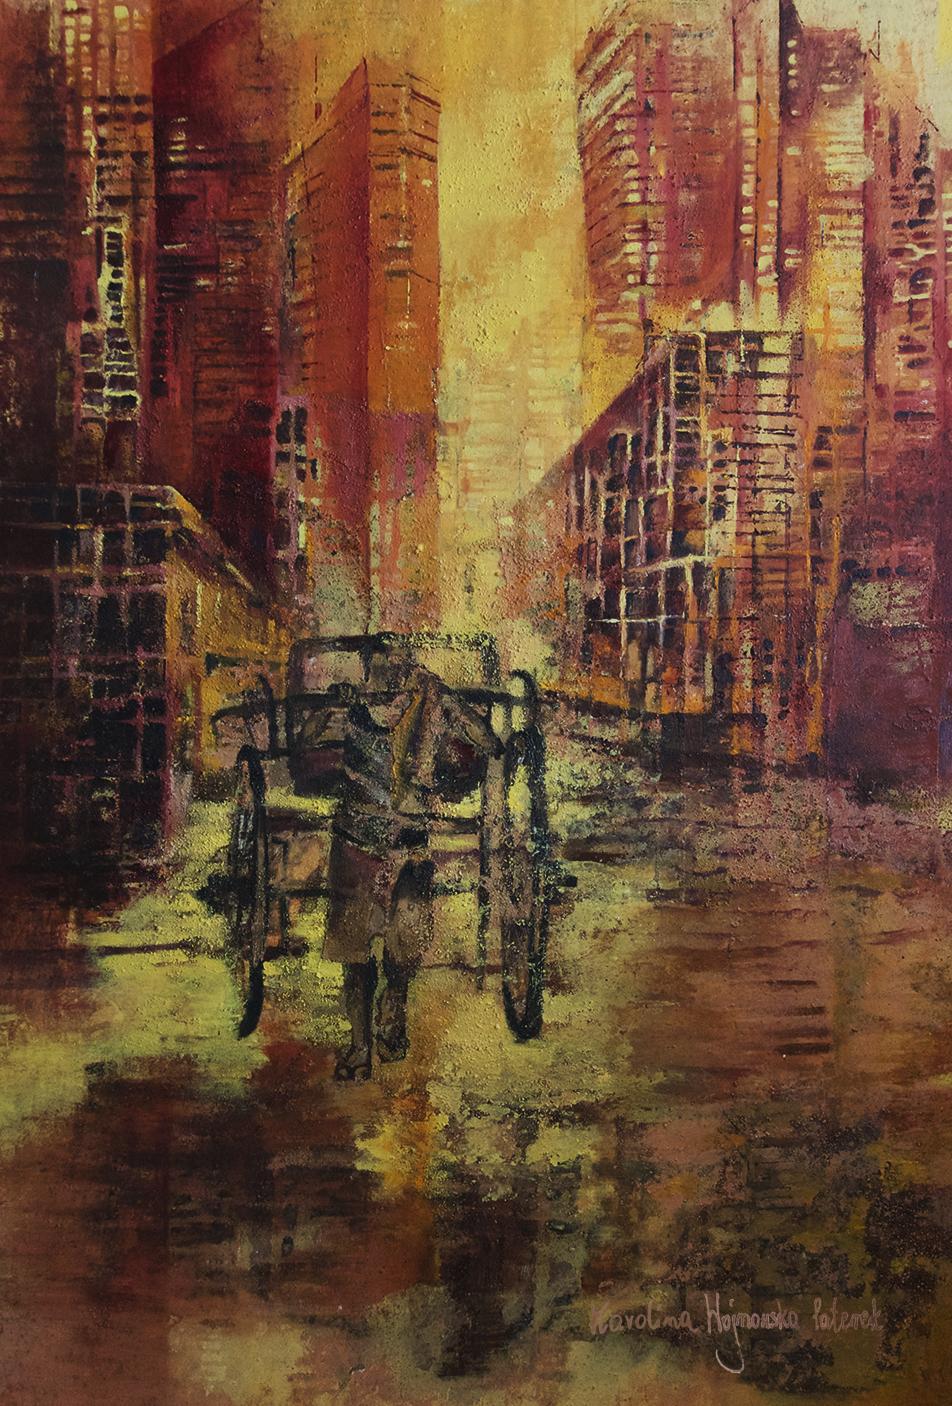 ArtArchitecture_gallery__Karolina_Paterek__Stalking_City_2019_oil_on_canvas_183x120_cm_Price 6000_